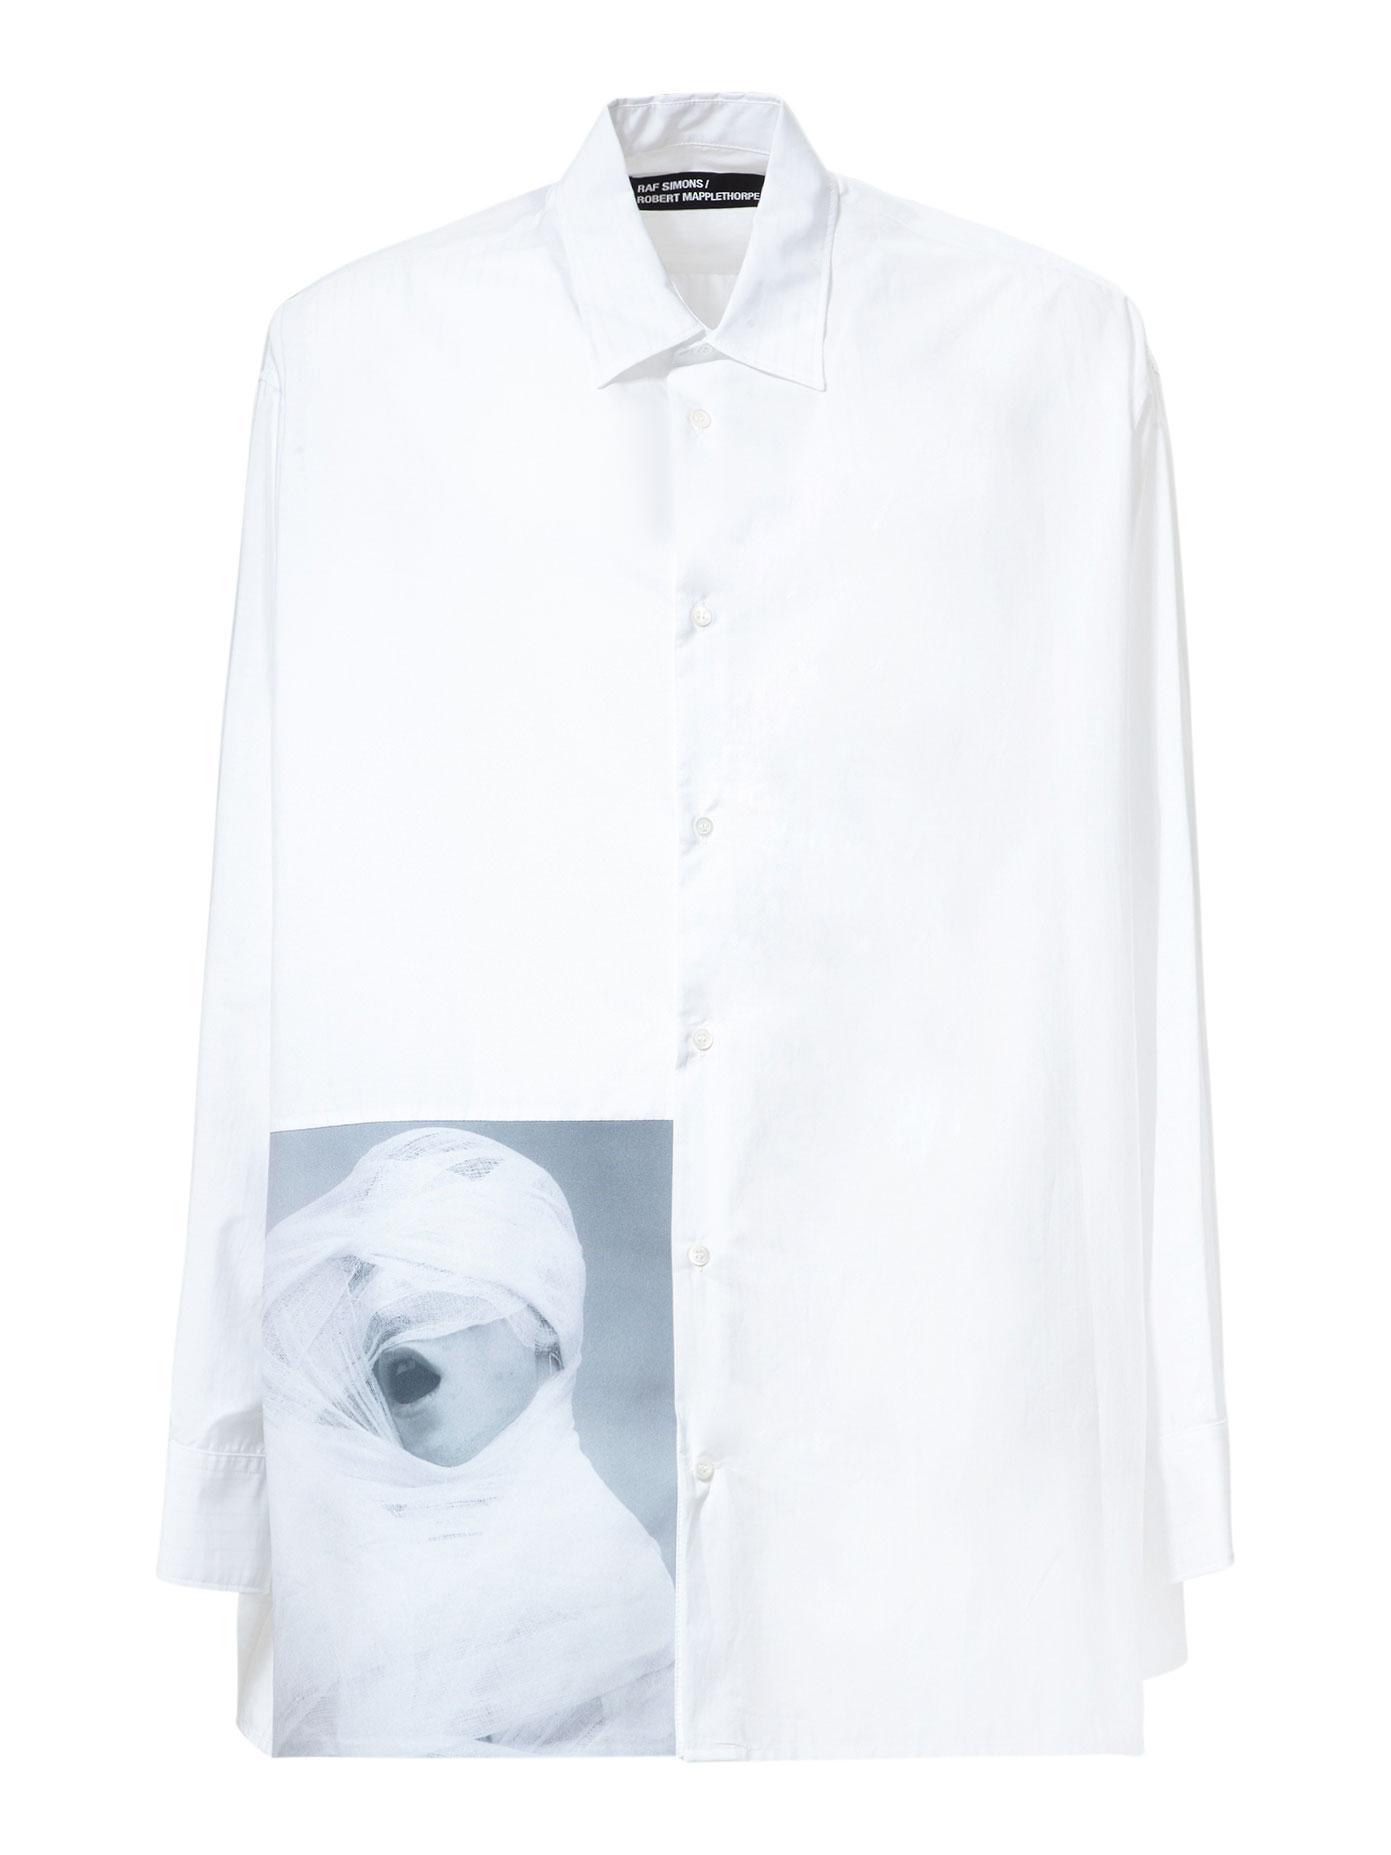 Lyst raf simons robert mapplethorpe white gauze cotton for Raf simons robert mapplethorpe shirt